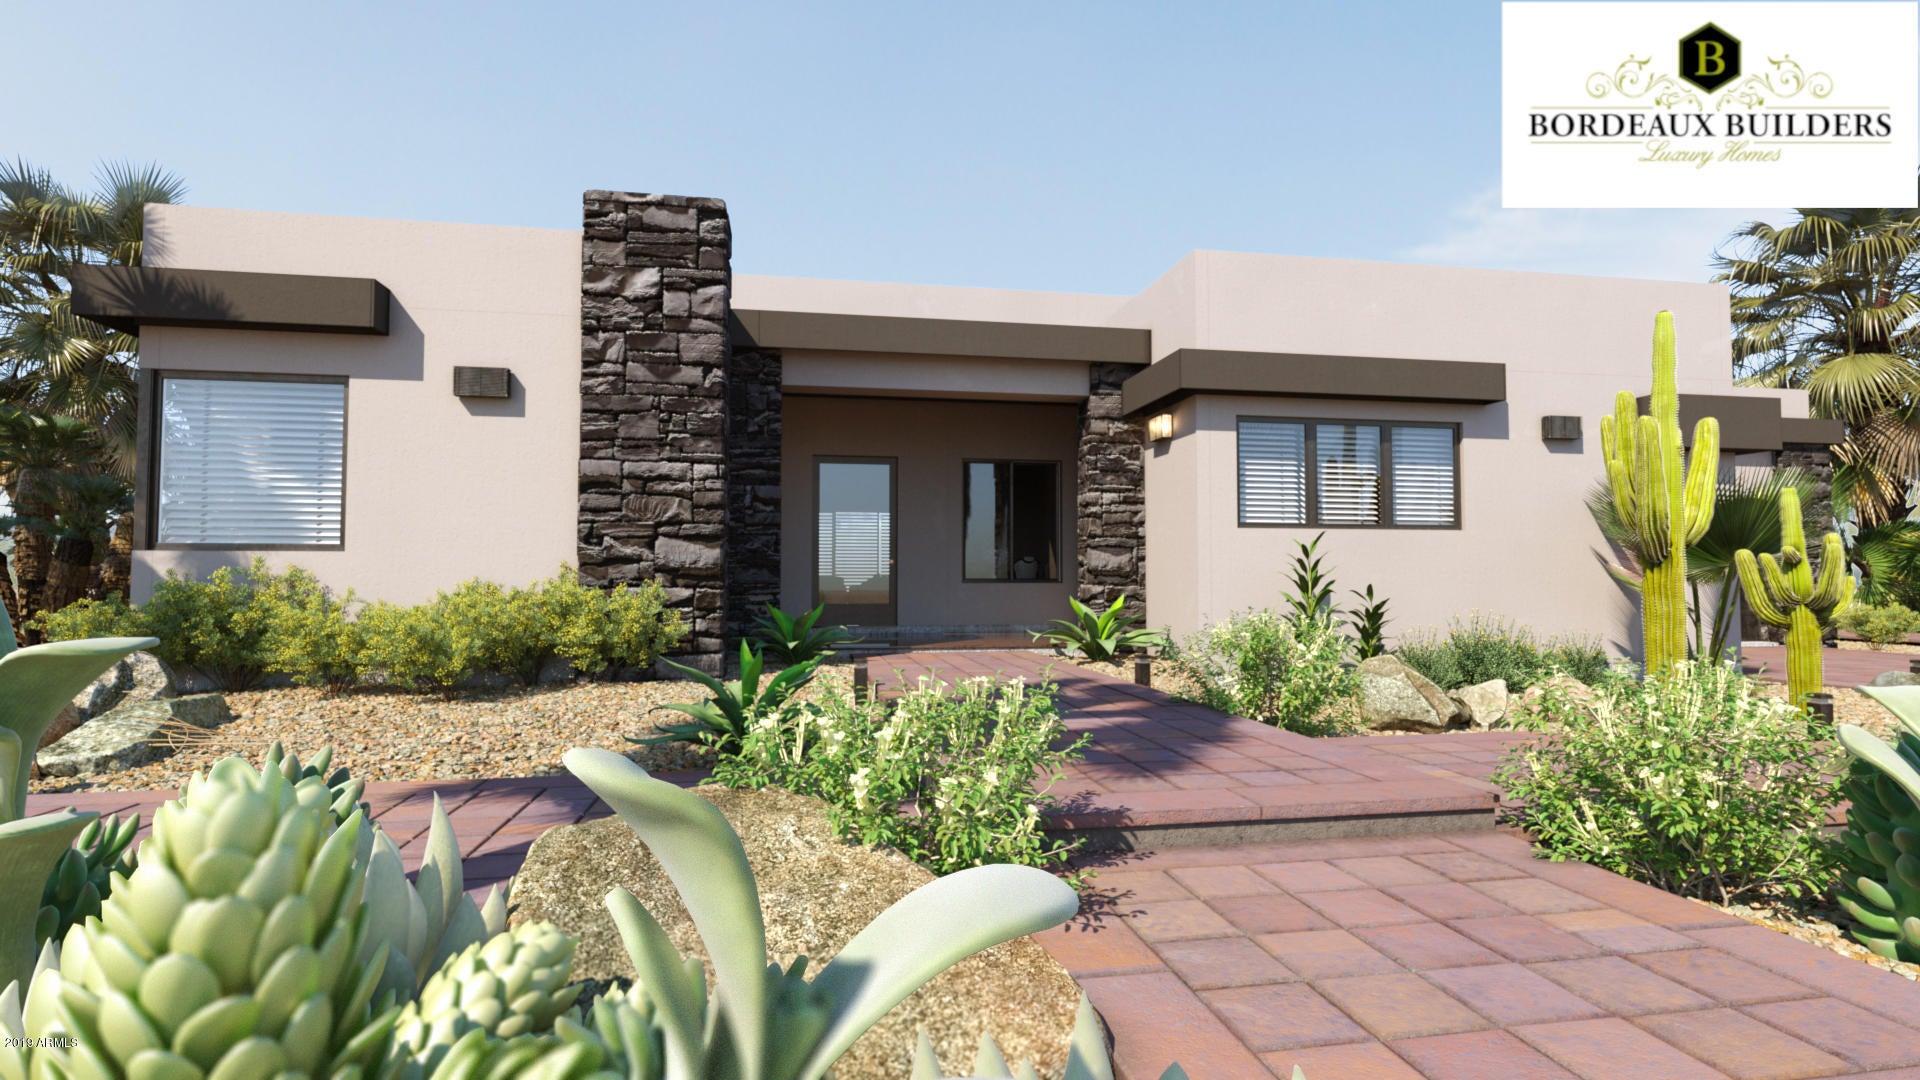 15421 E CRESTED BUTTE Trail, Fountain Hills, AZ 85268